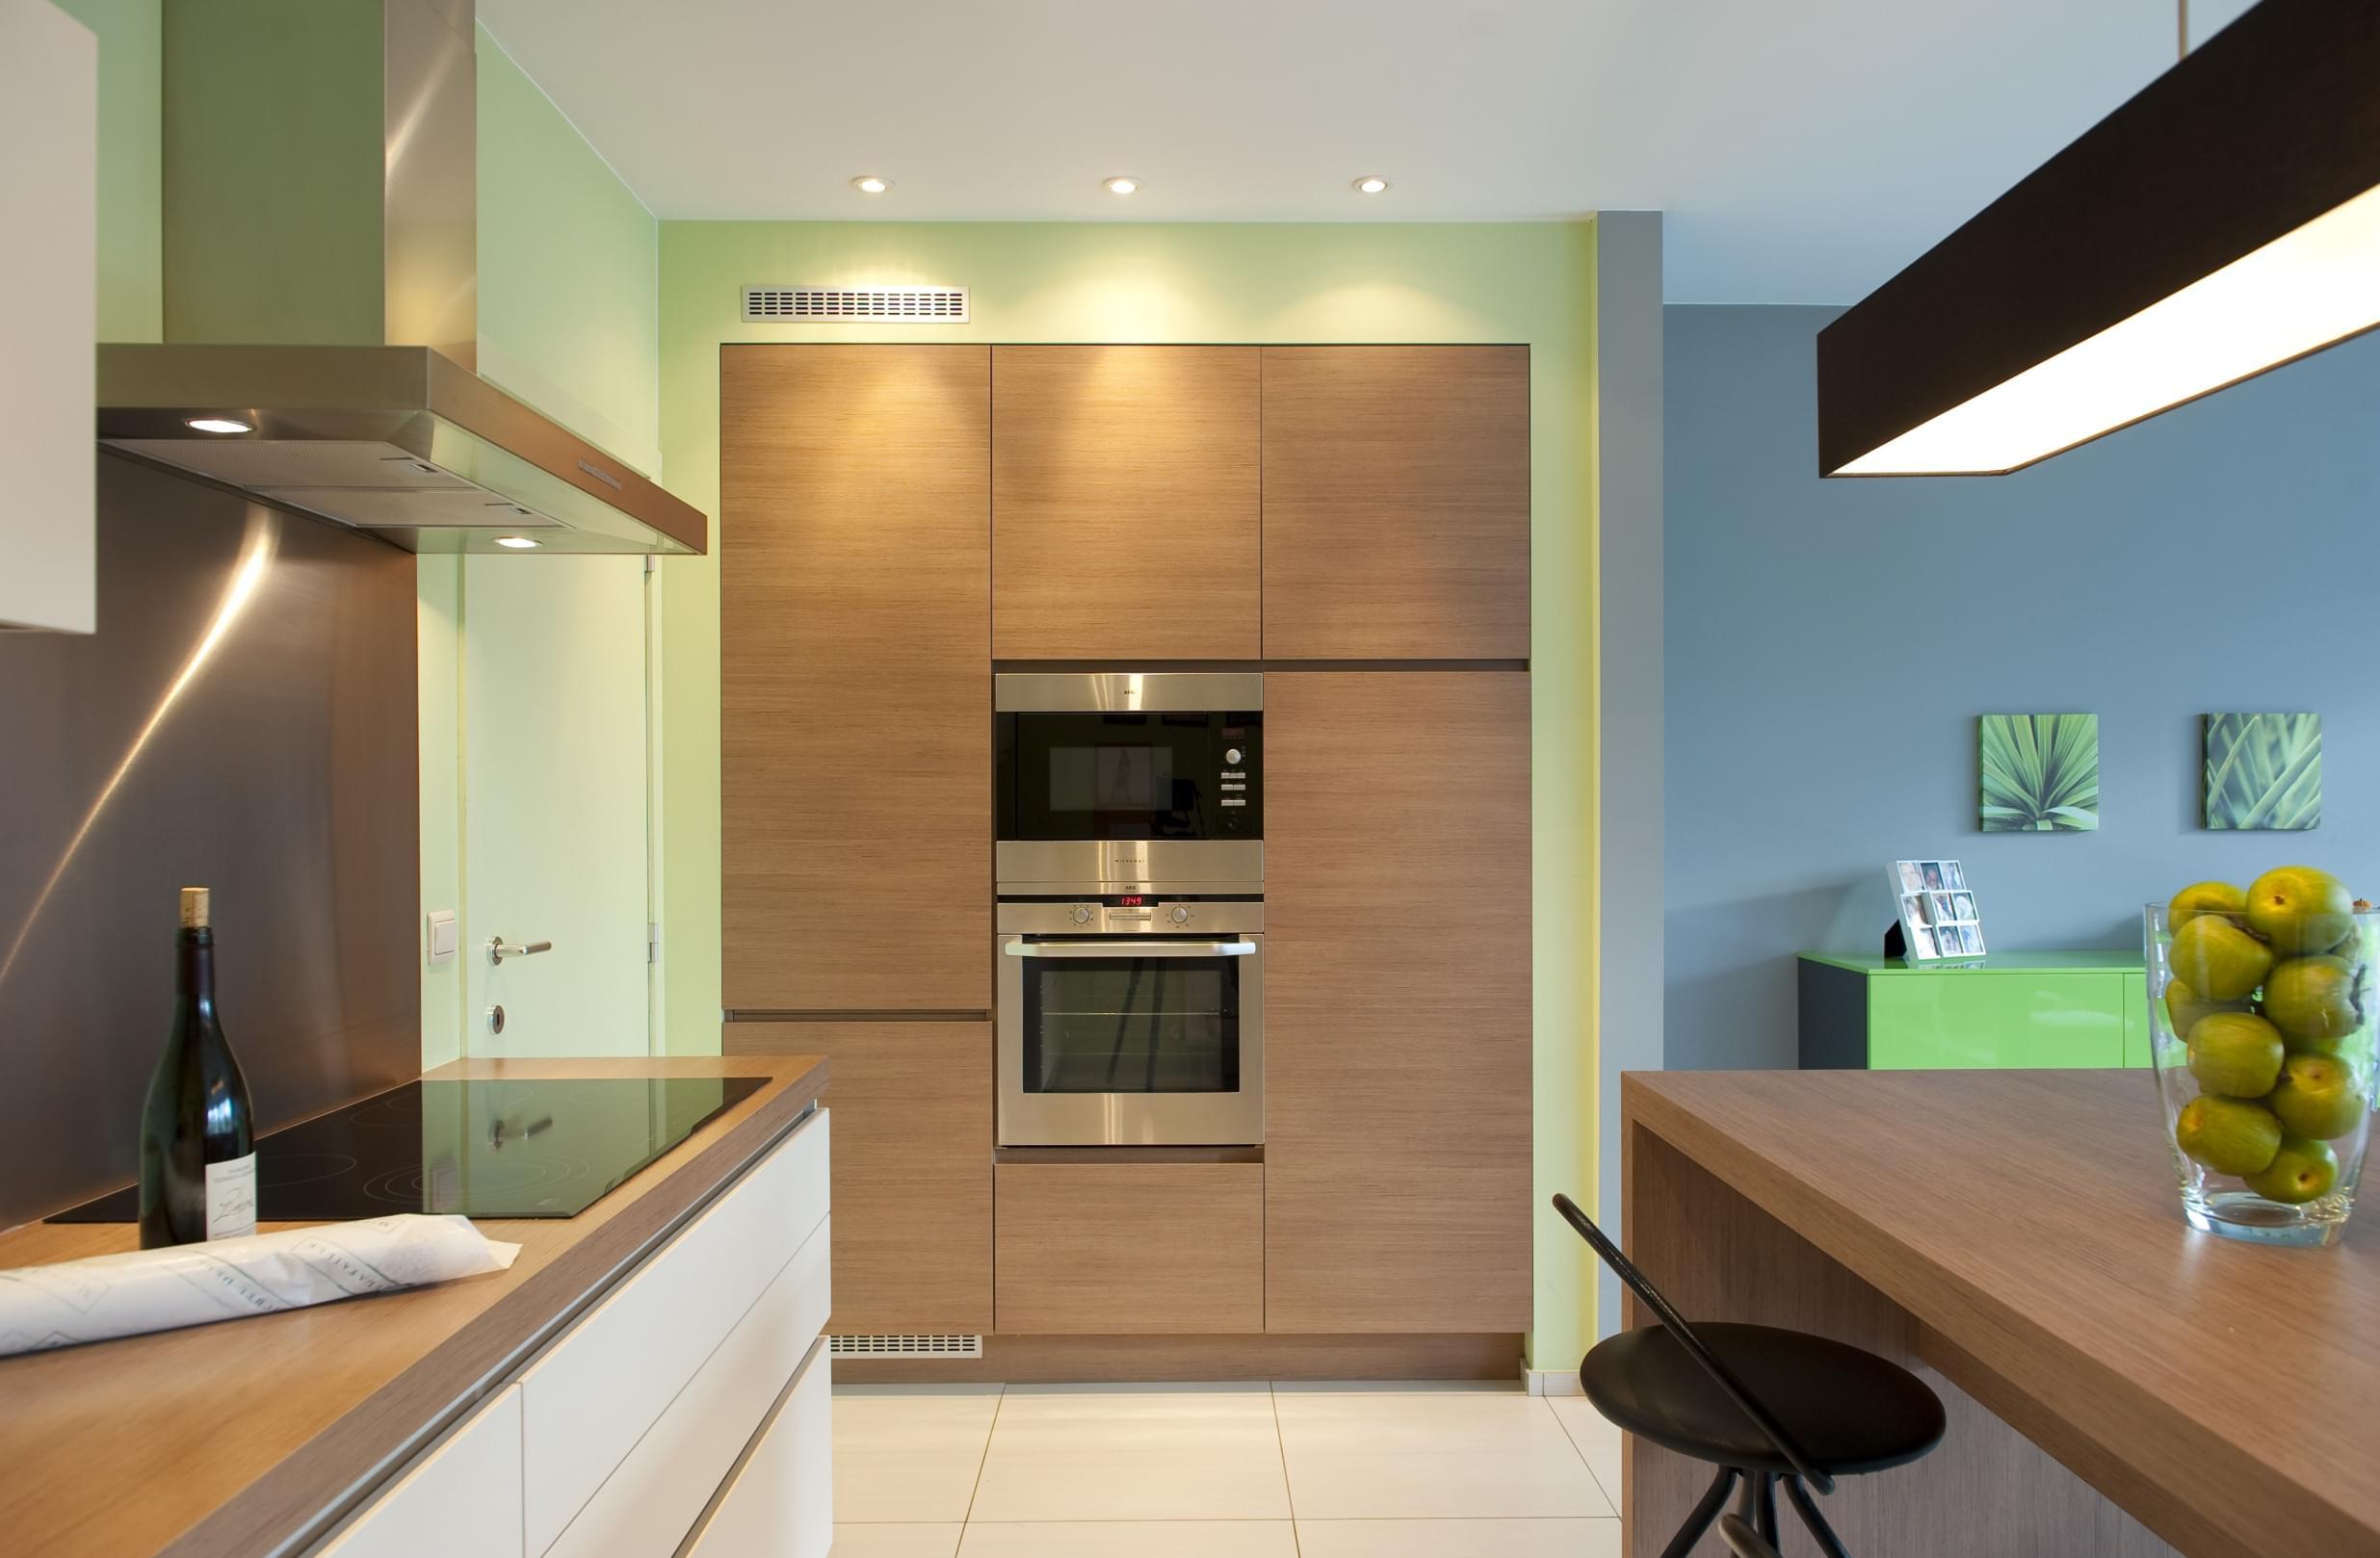 3701-keuken-oven